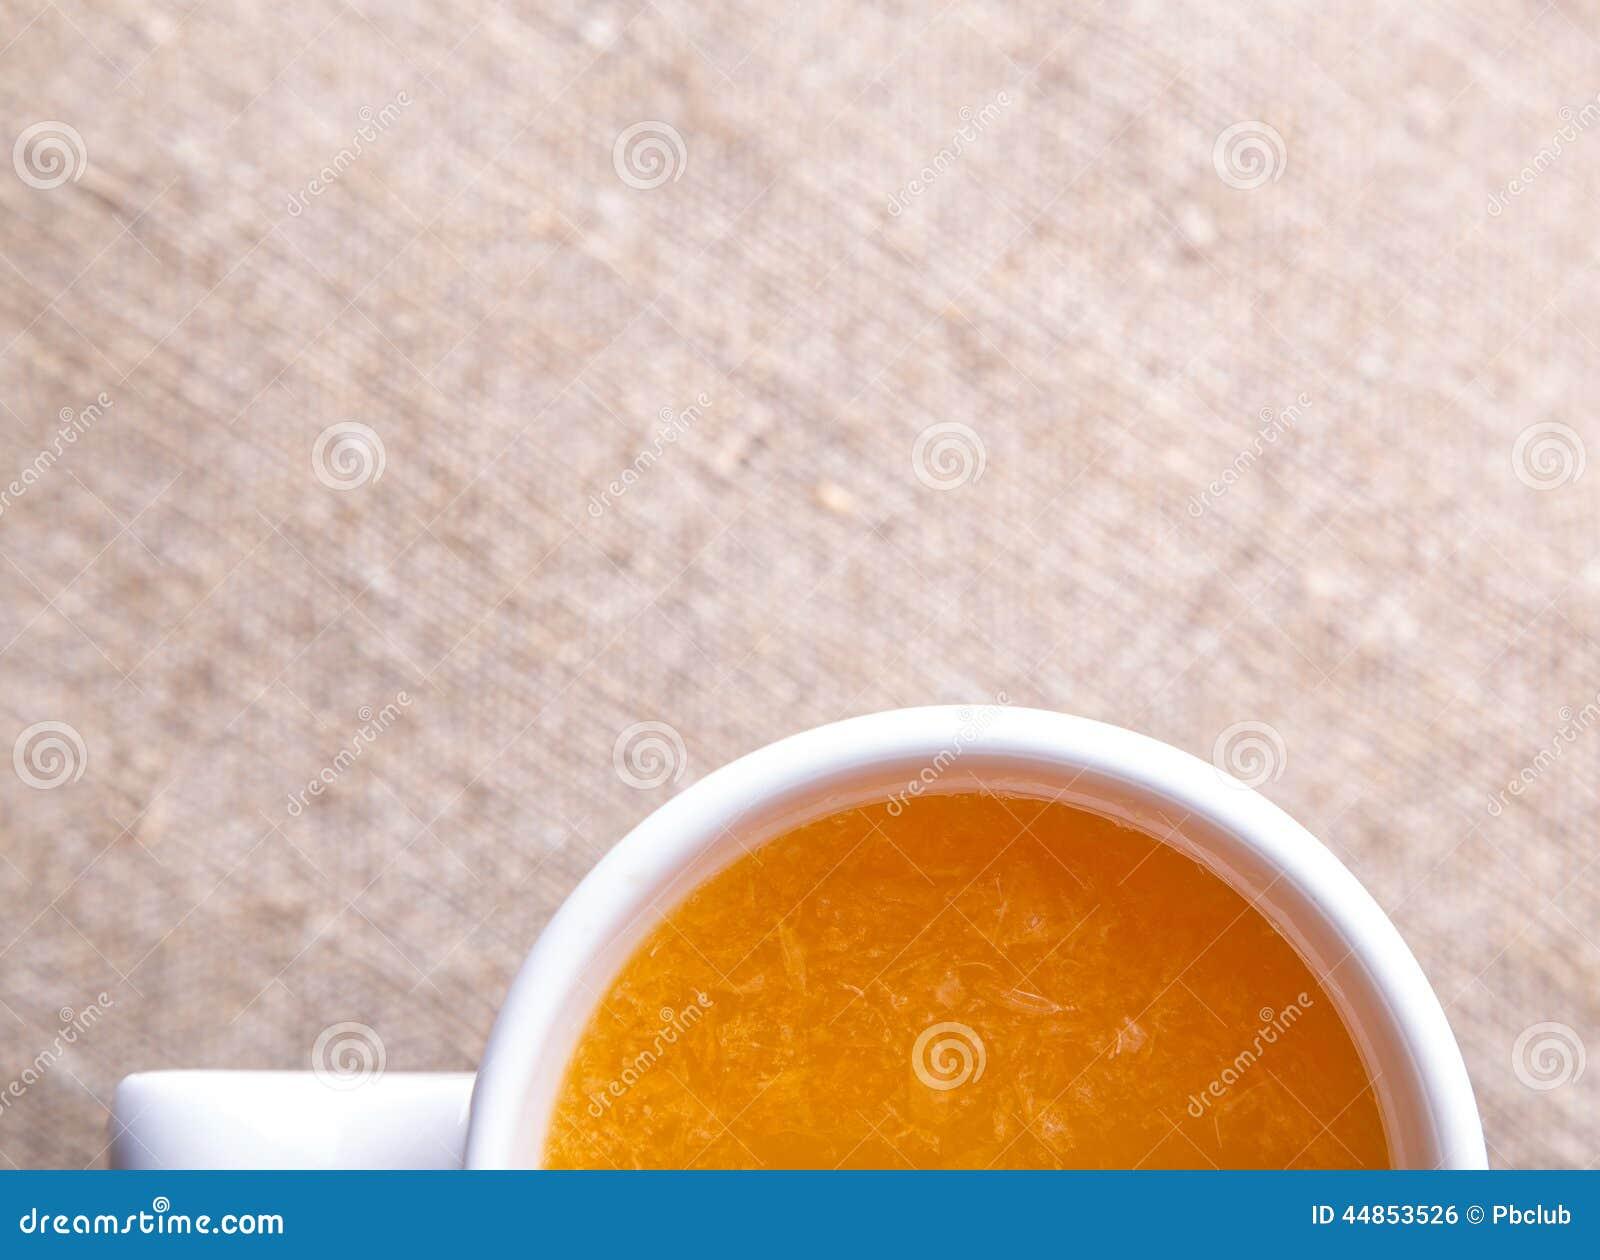 Taza de zumo de naranja fresco